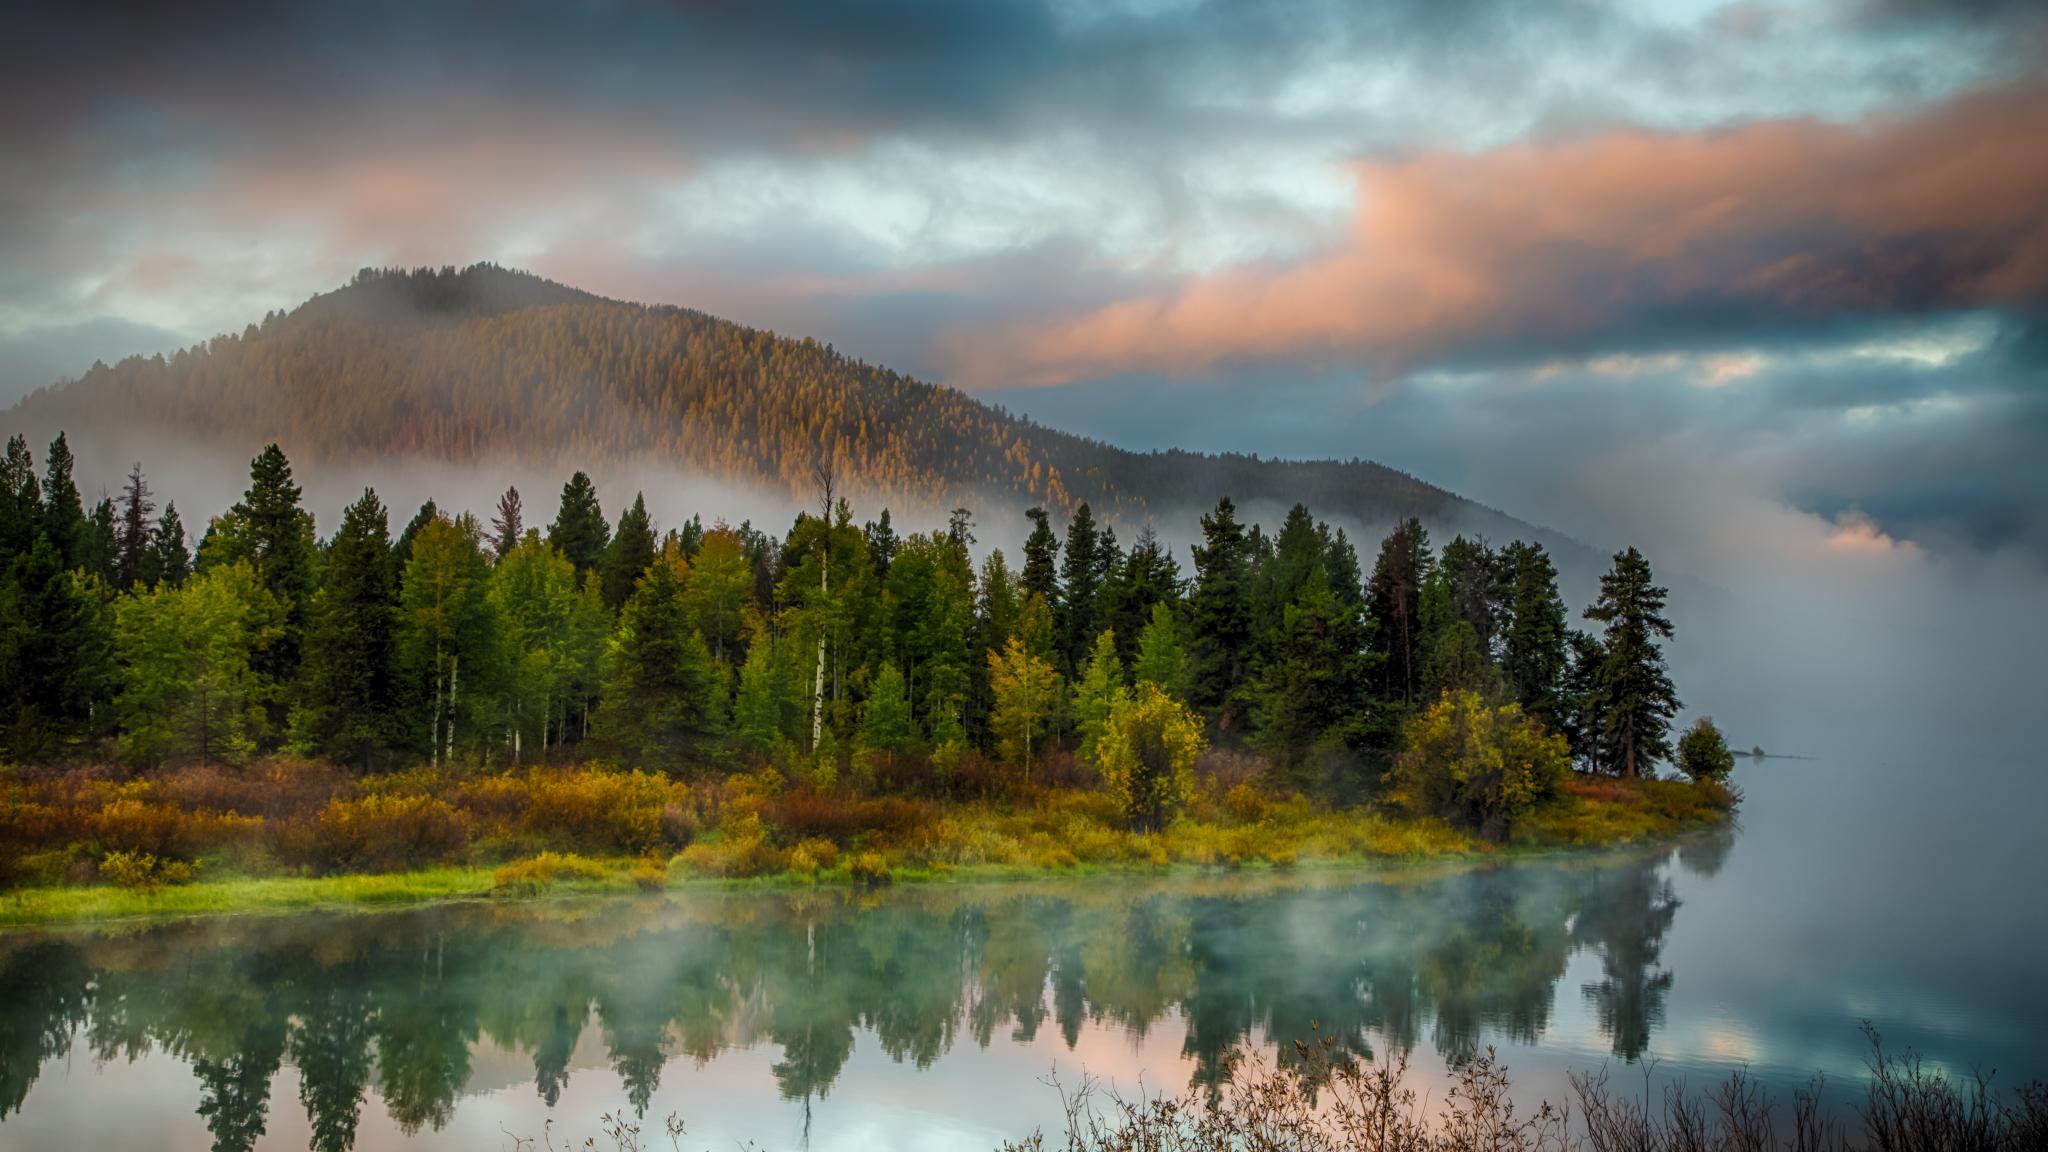 Starry Fall Night Wallpaper Grand Teton National Park Wyoming United States Sunrise